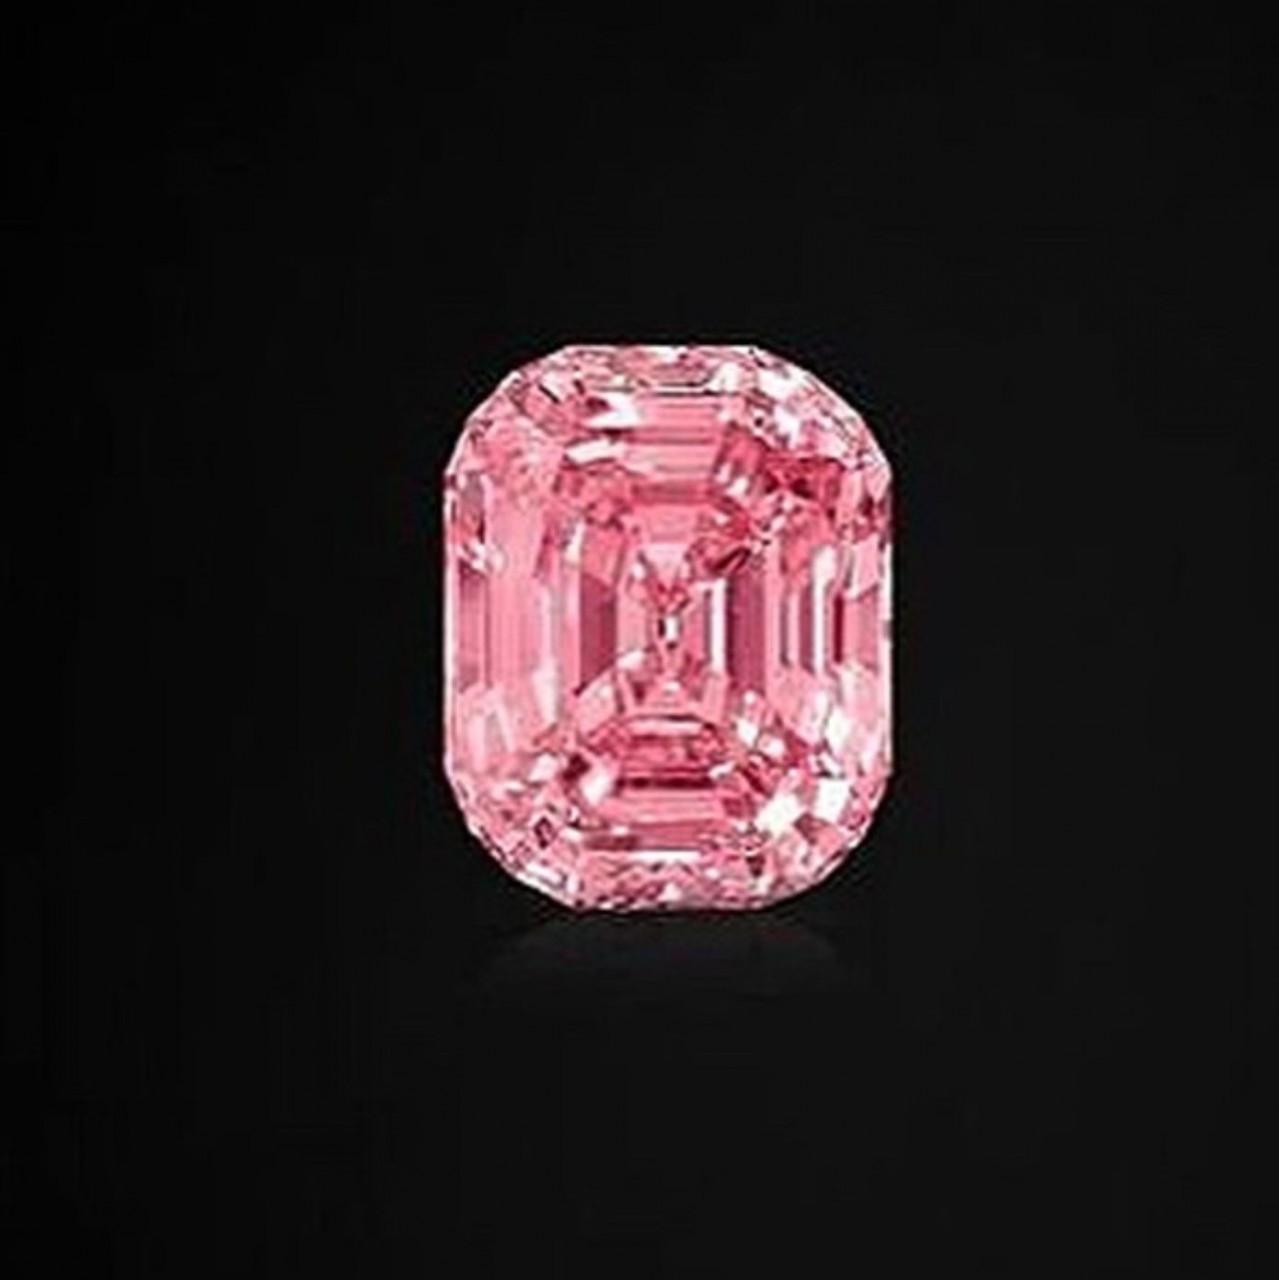 Holiday Sales May Validate Diamond Concerns